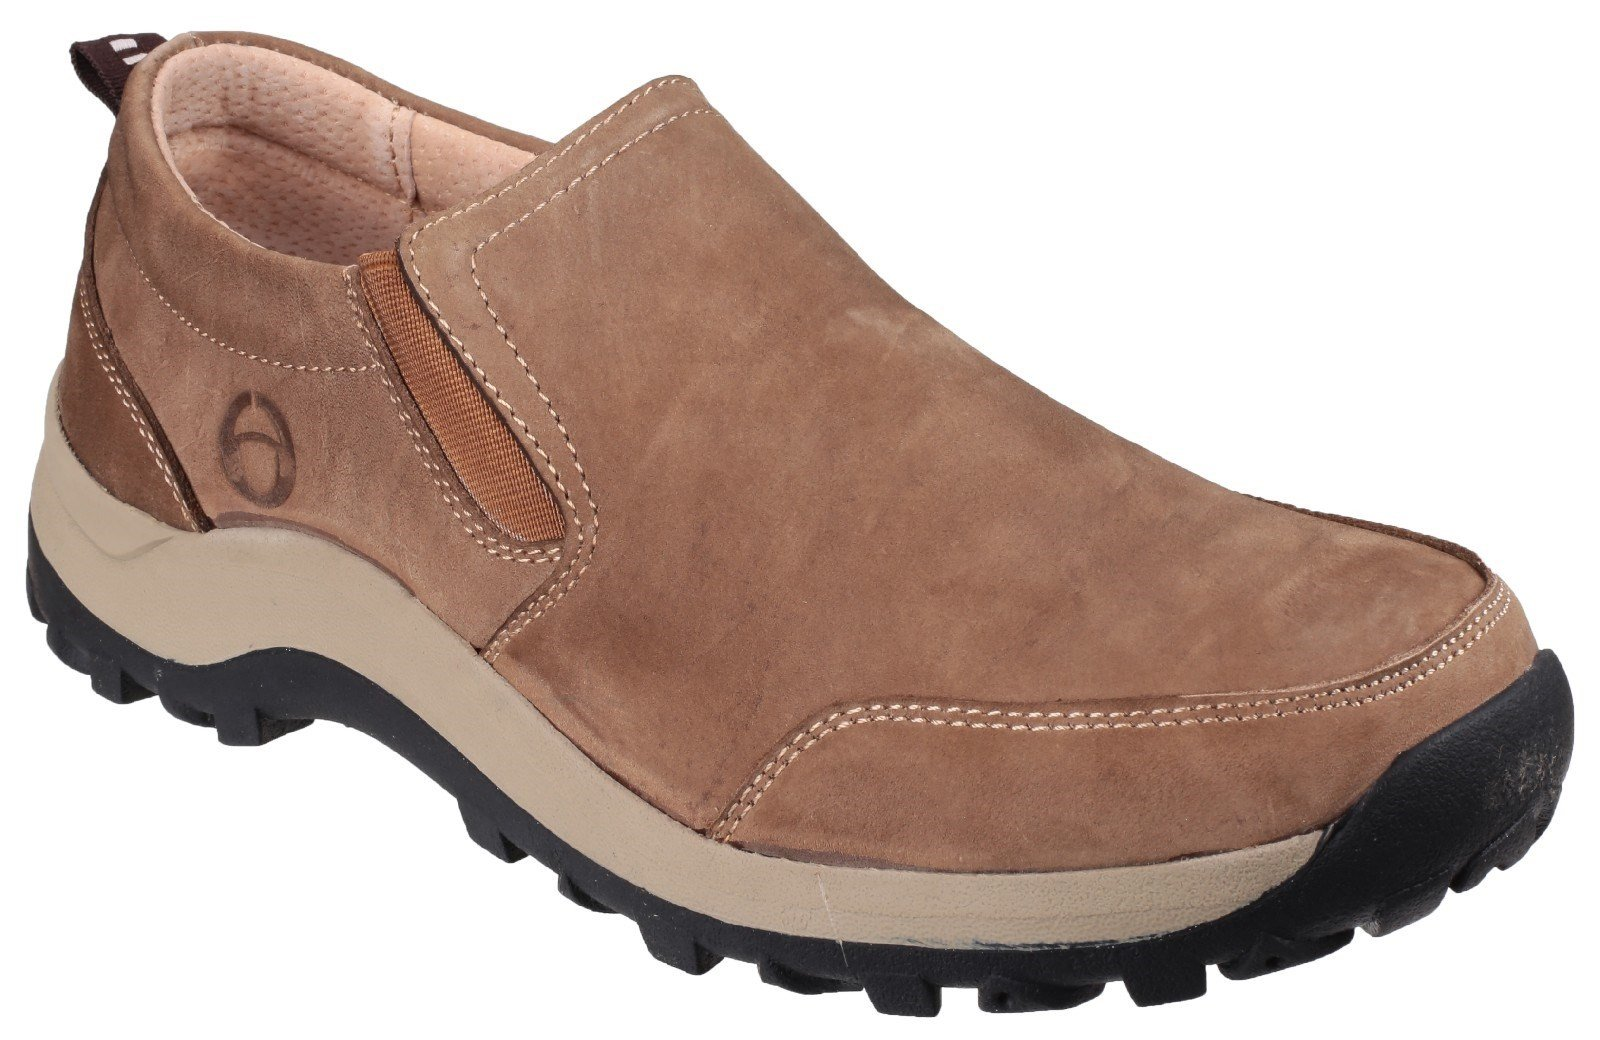 Cotswold Men's Sheepscombe Slip On Shoe Various Colours 23601 - Tan 6.5